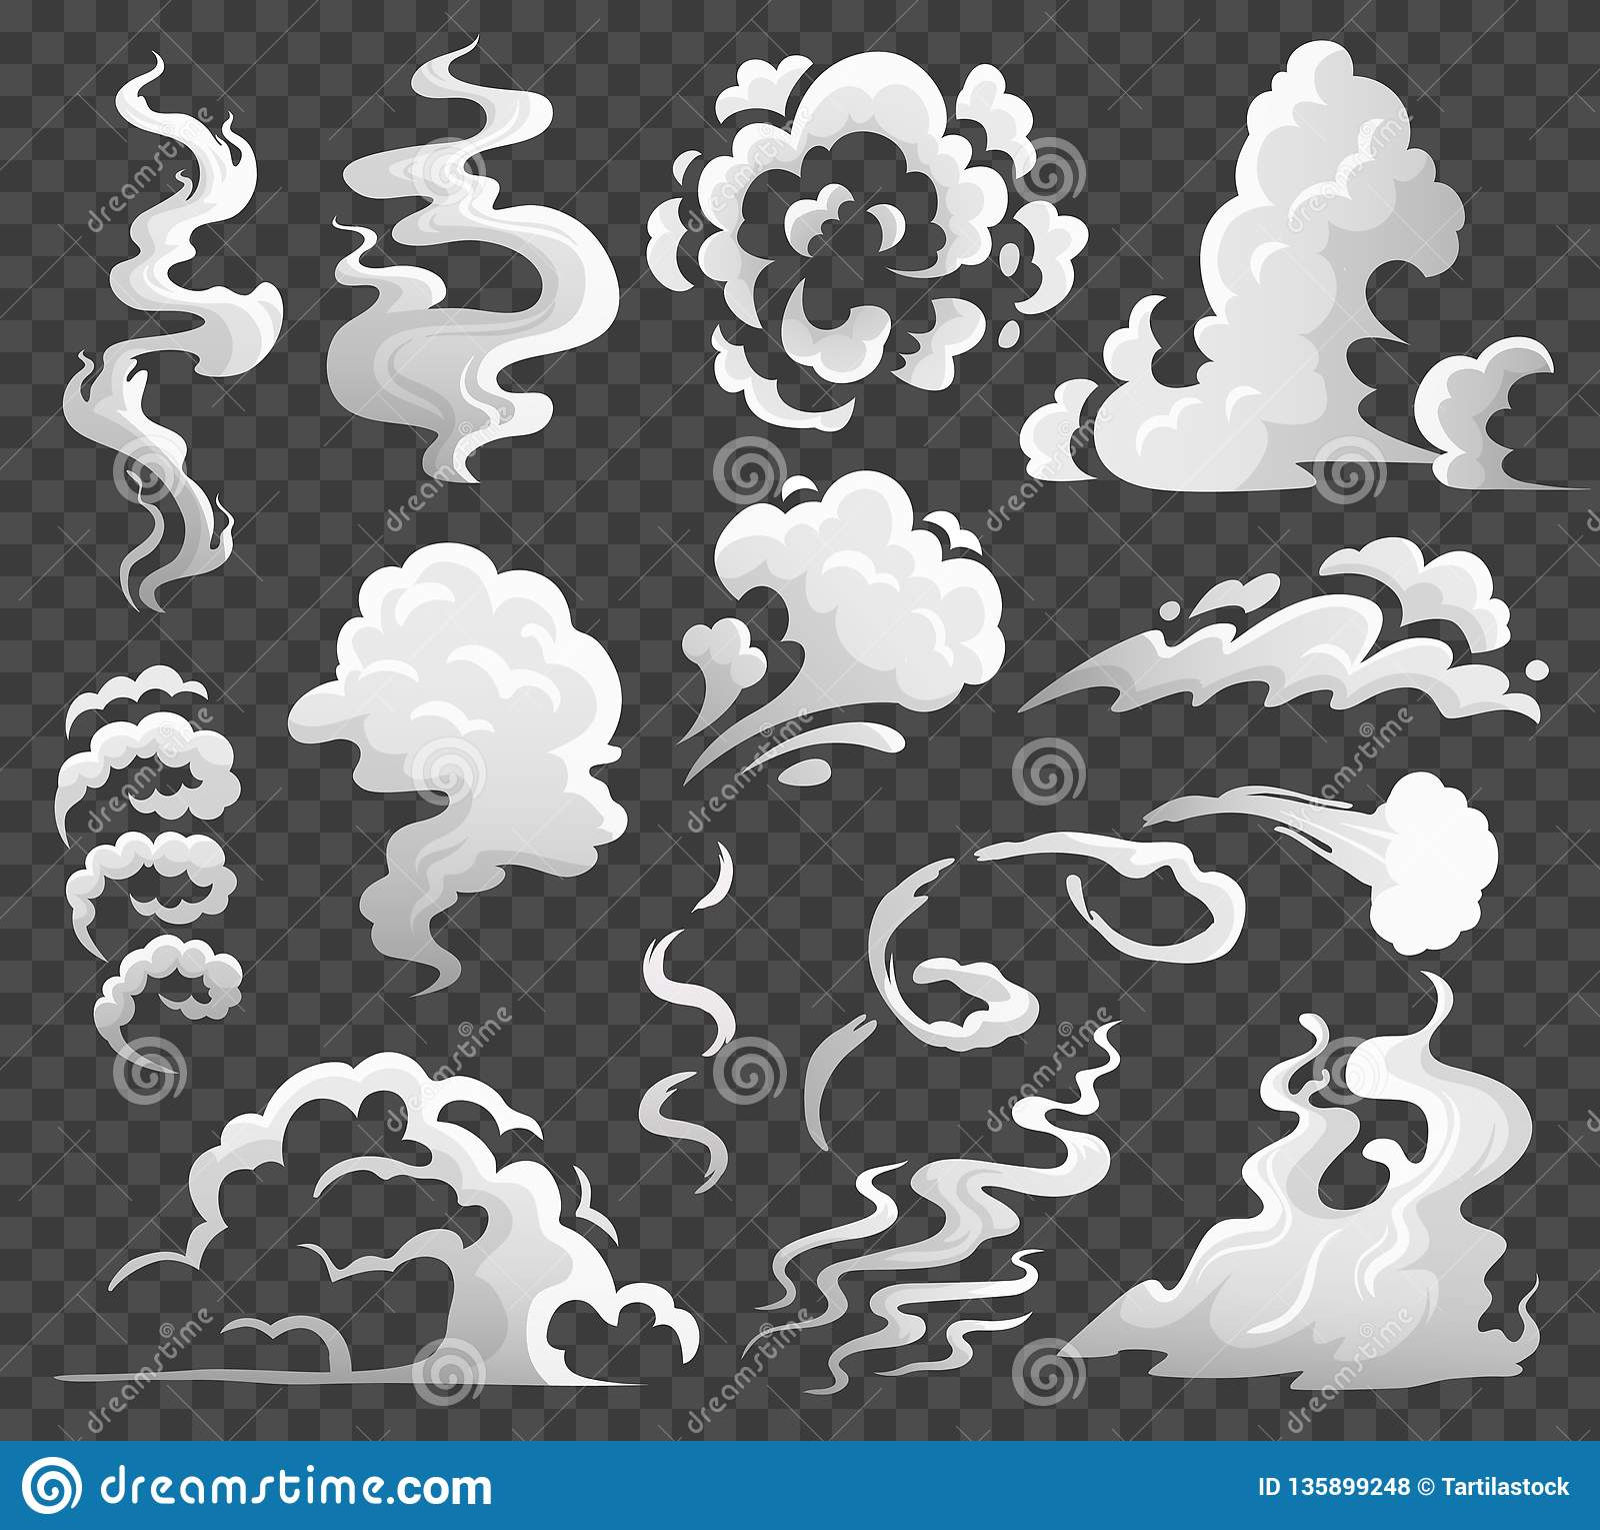 Smoke Clouds. Comic Steam Cloud, Fume Eddy And Vapor Flow ...